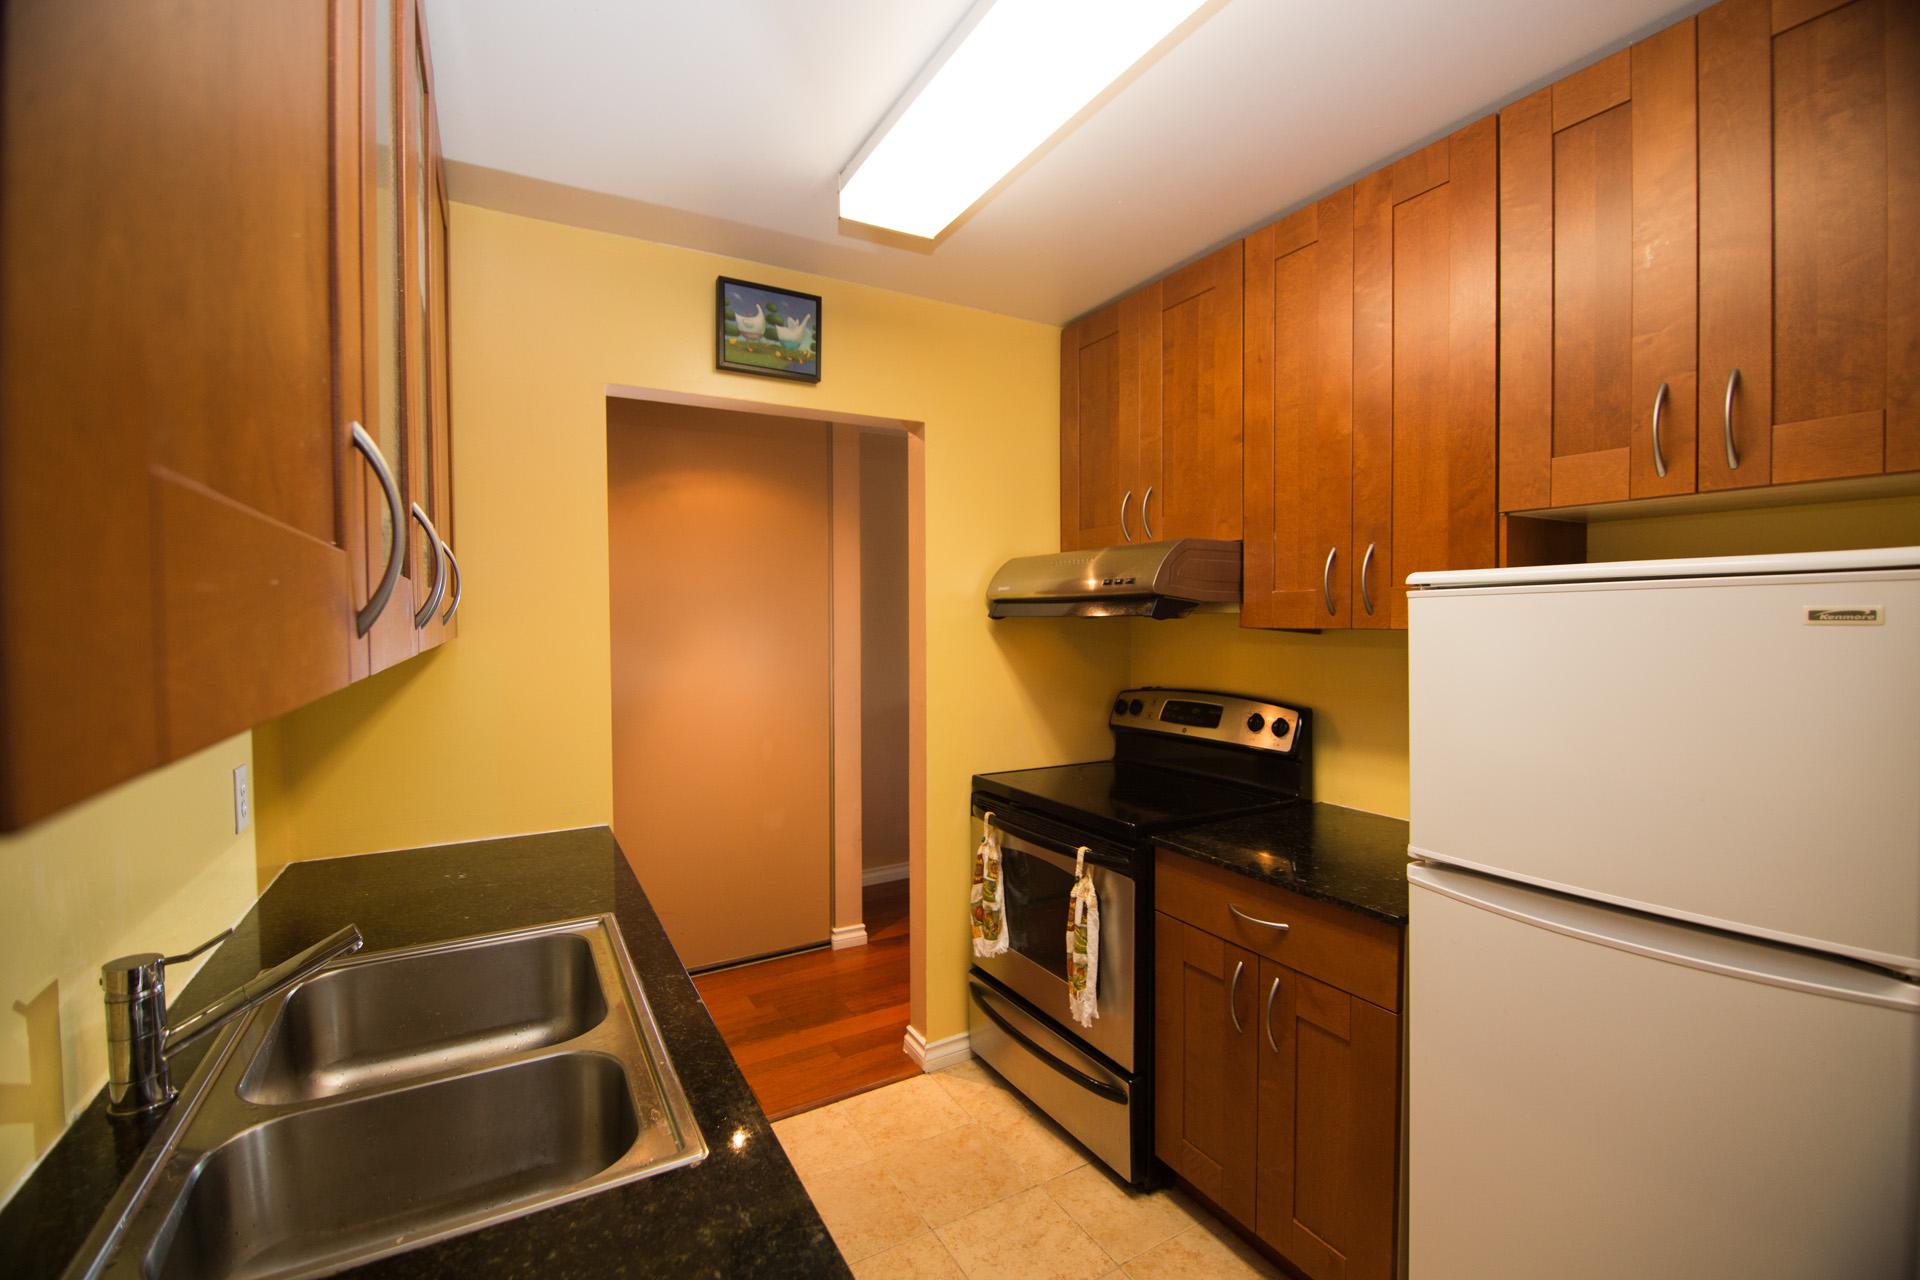 apartment 03.jpg